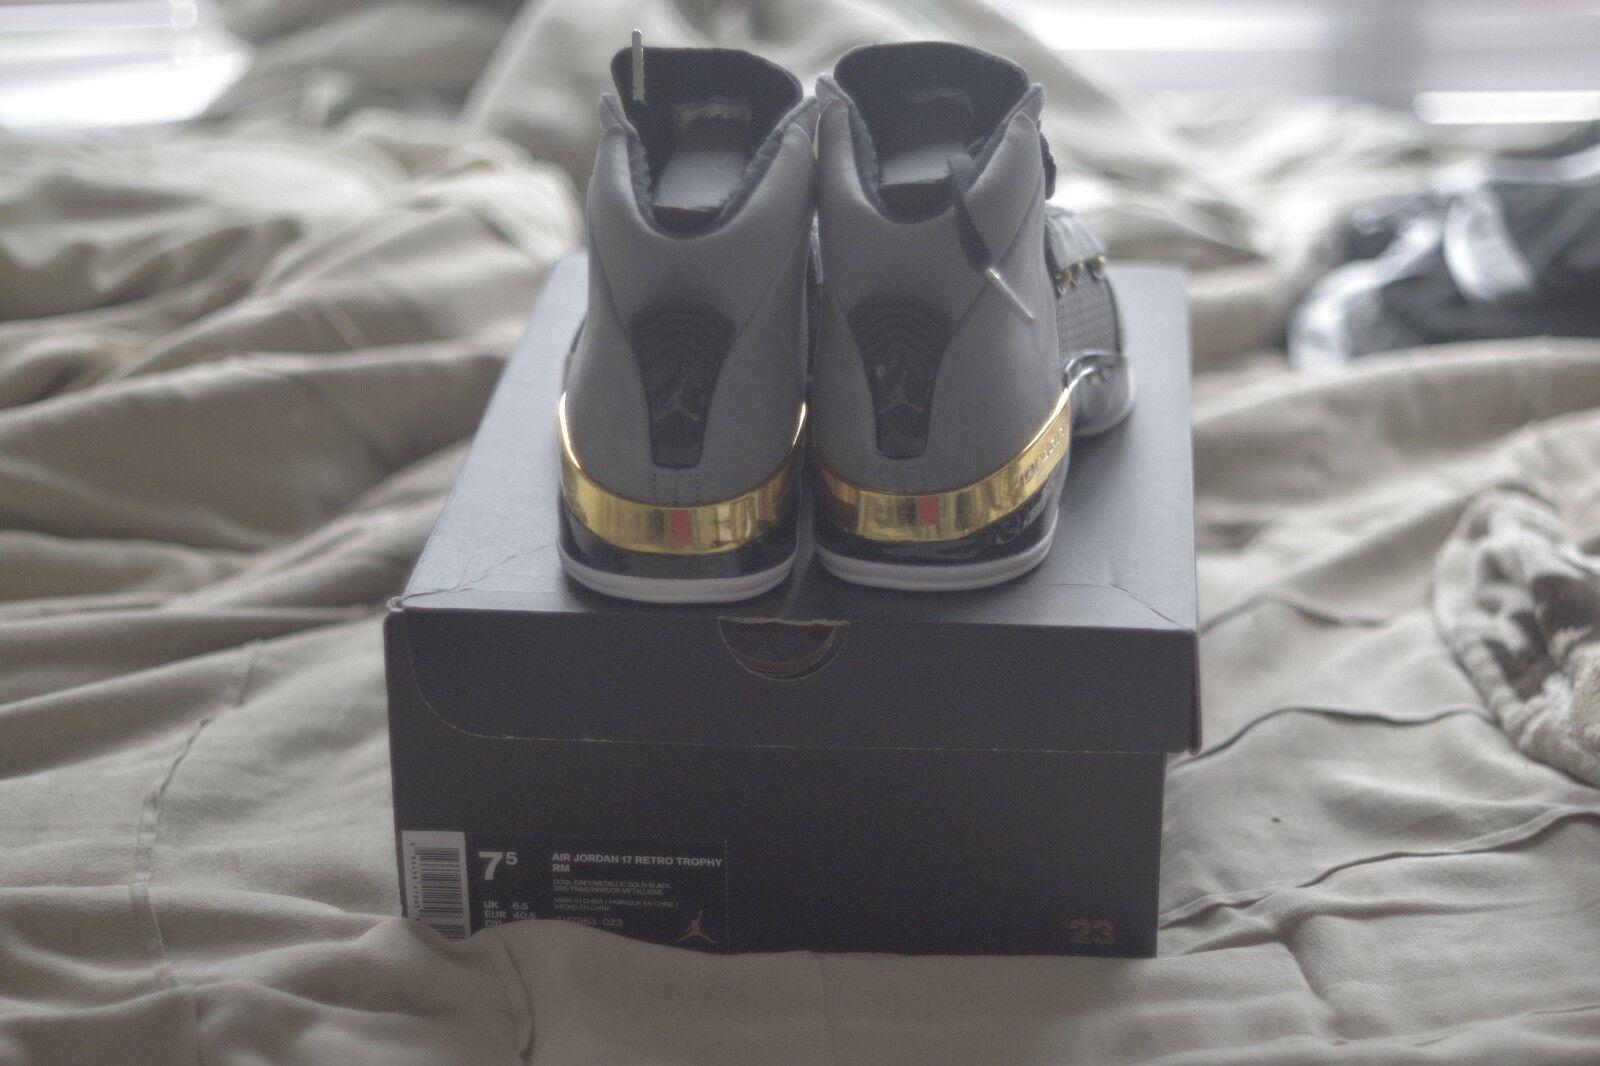 NEW Nike Air Jordan Retro 17 Trophy Room Size 7.5